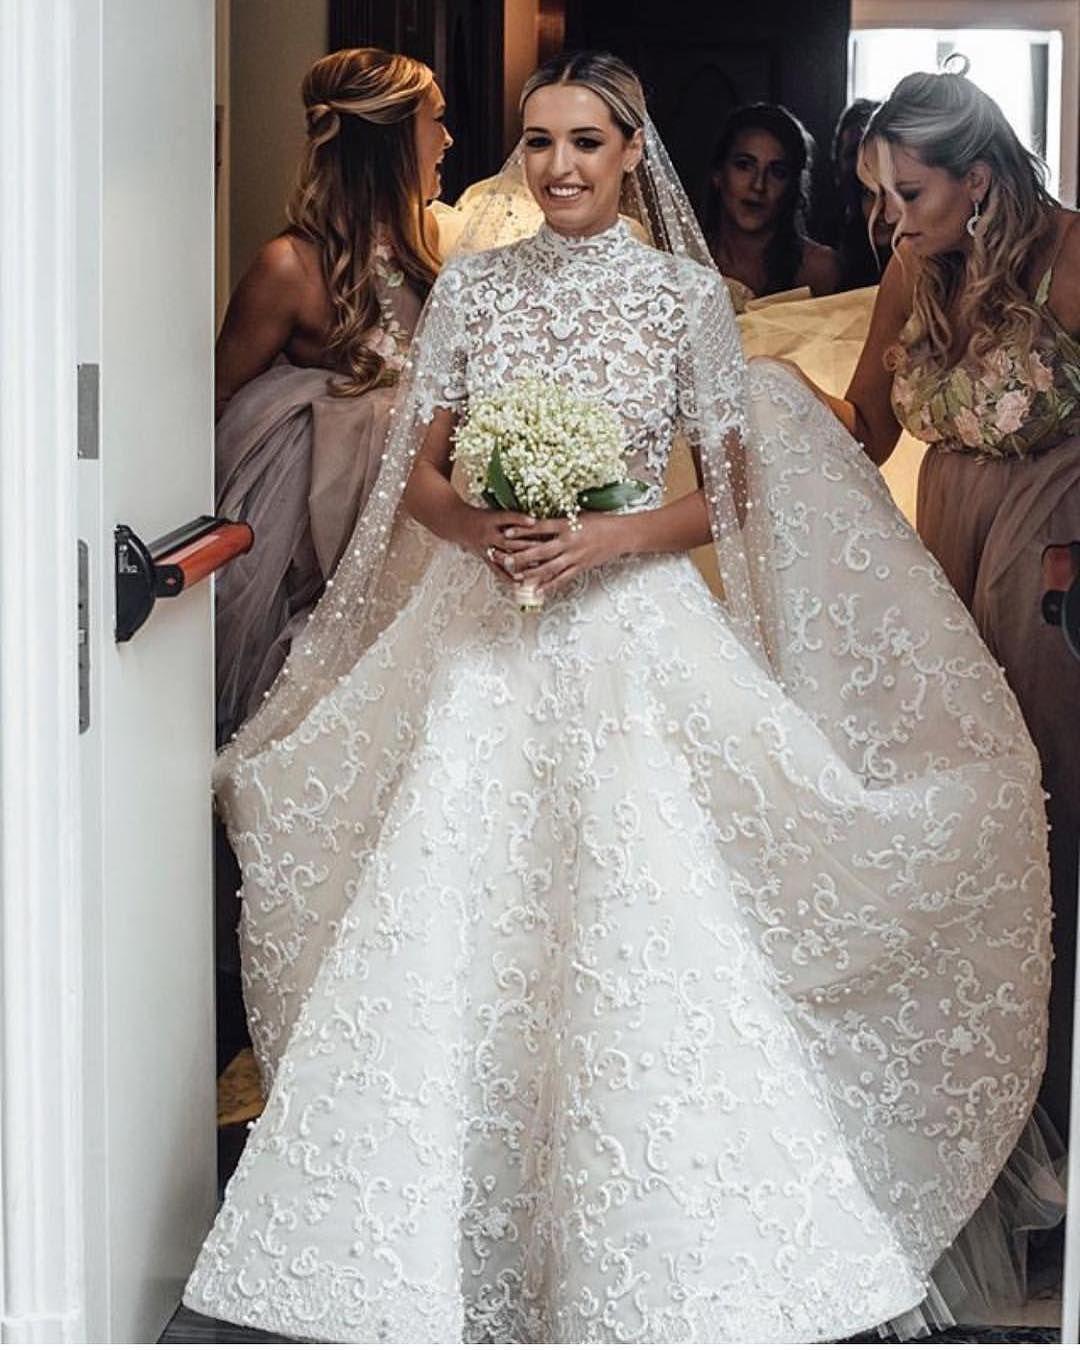 USA Replica Wedding Dresses - Inspired Designer Evening Gowns ...